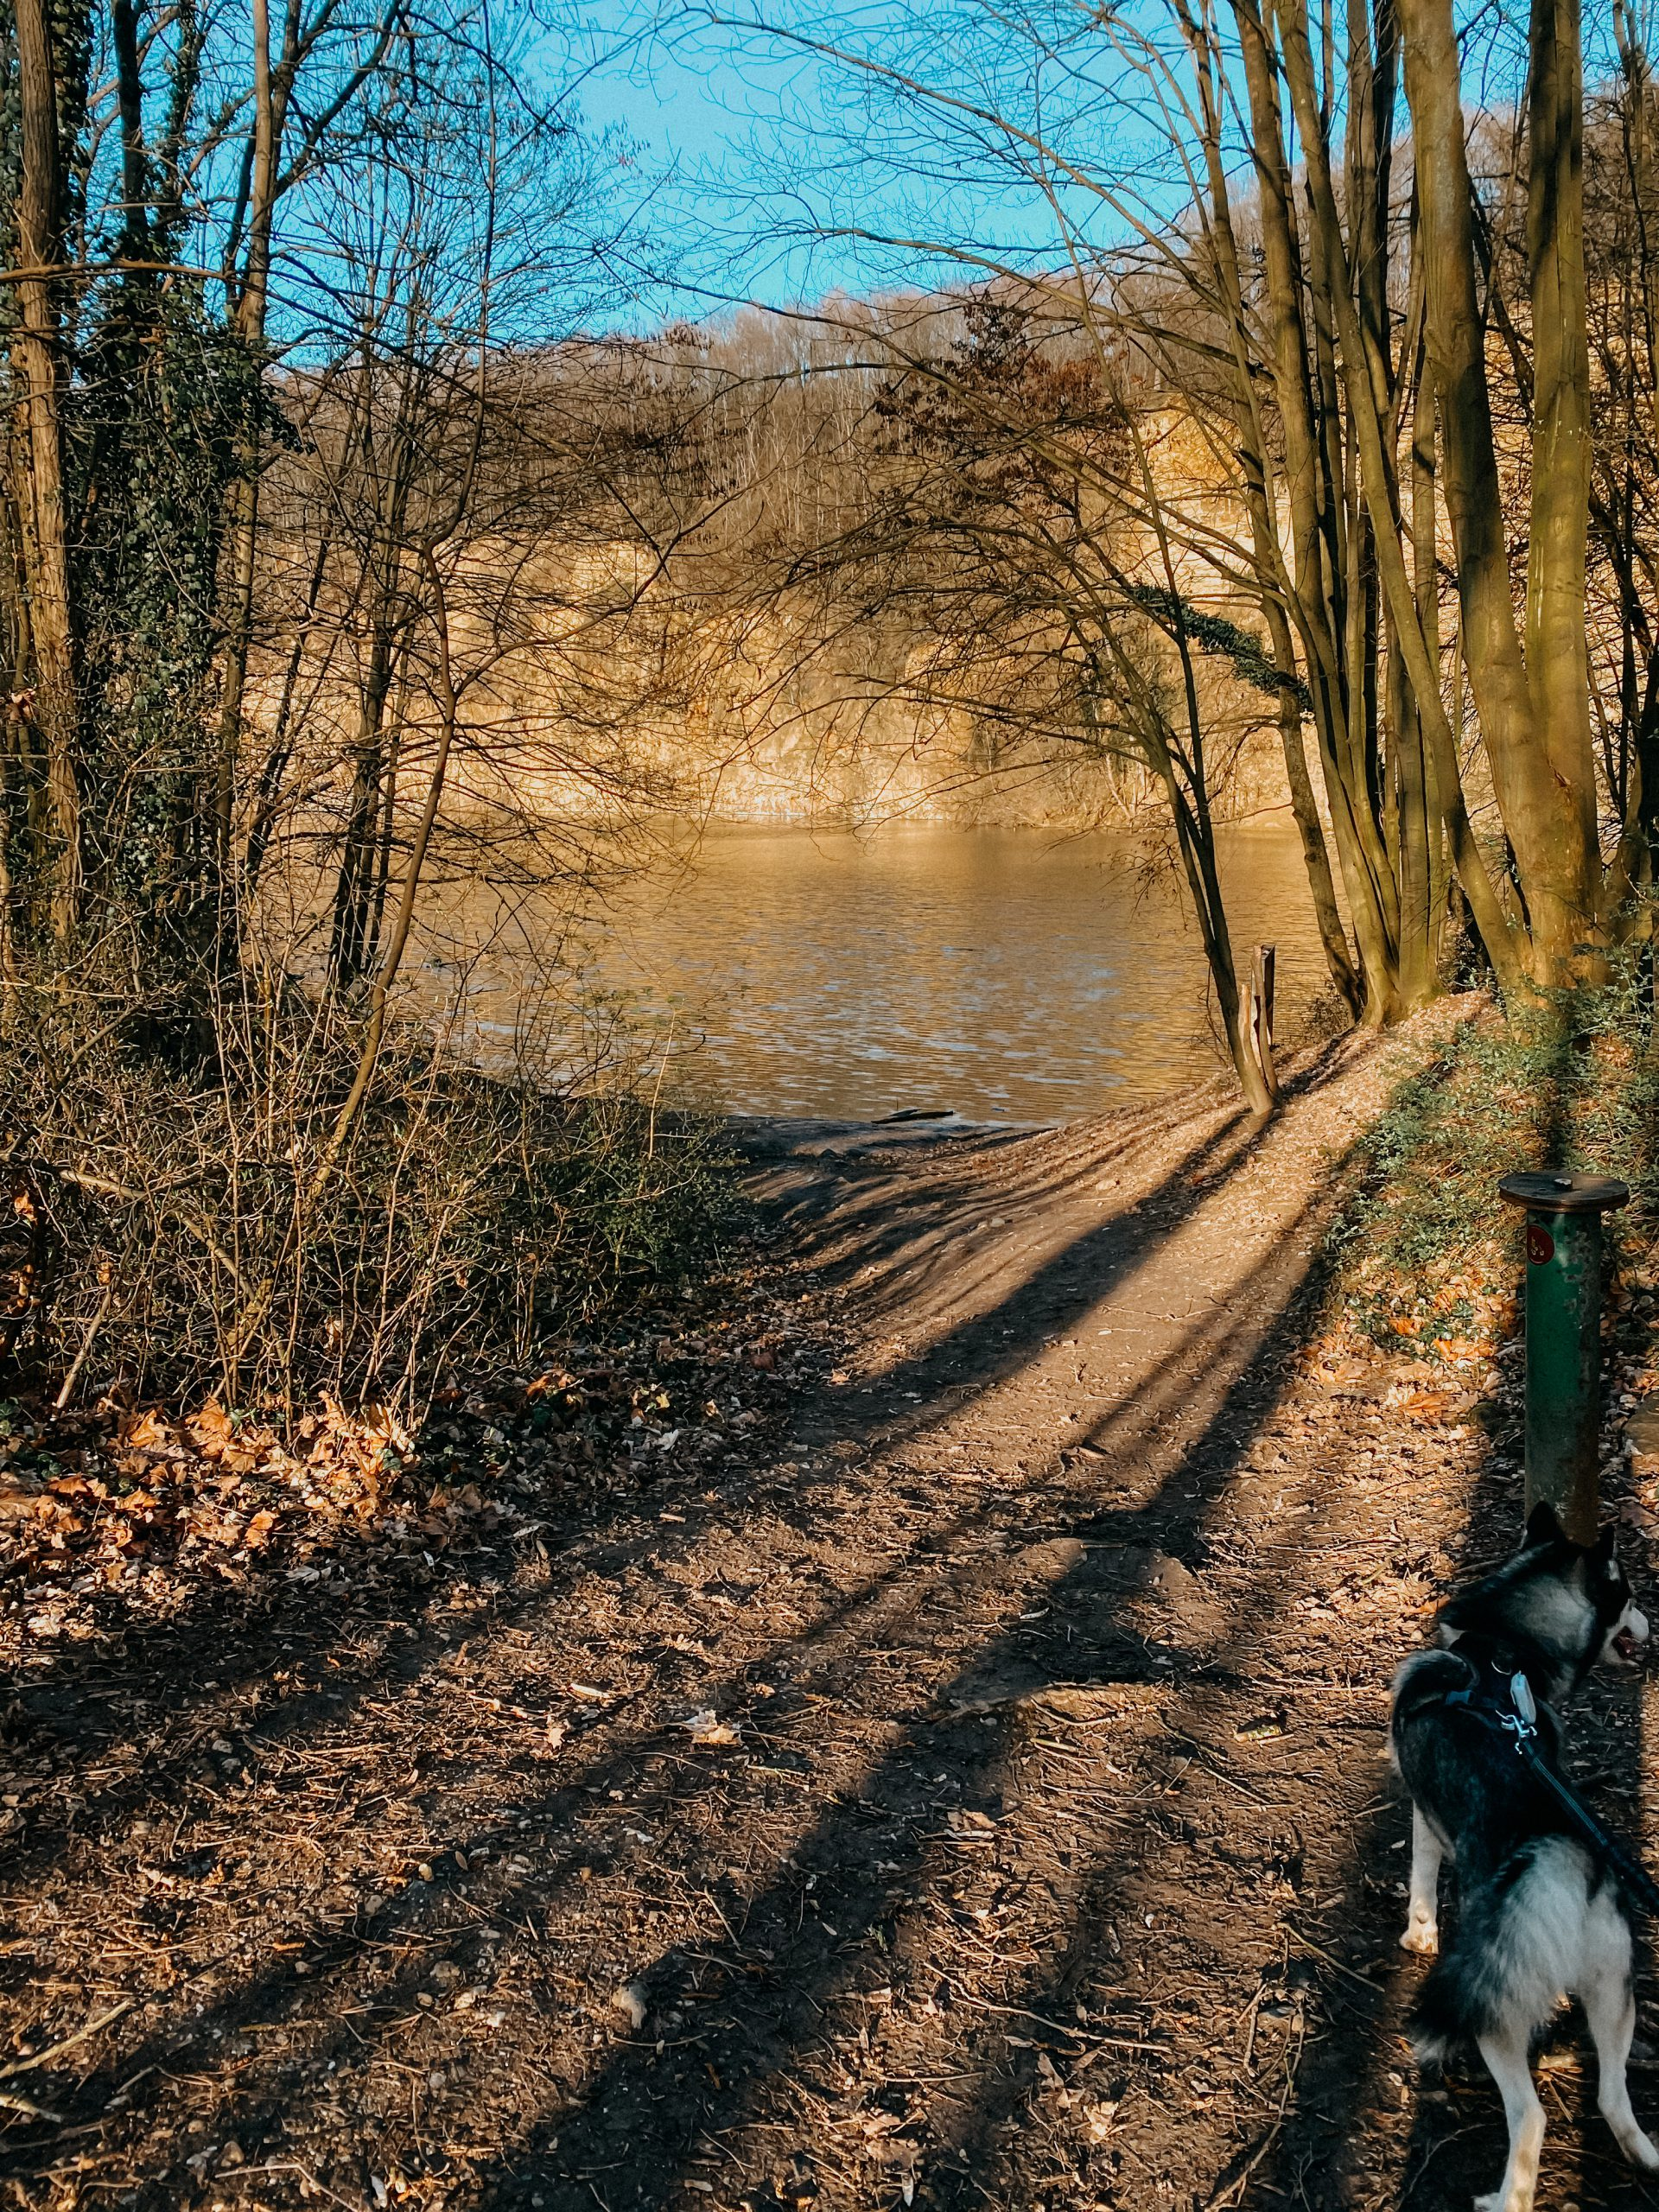 Wanderungen Bonn Wandertour Top Wandern Dornheckensee 2